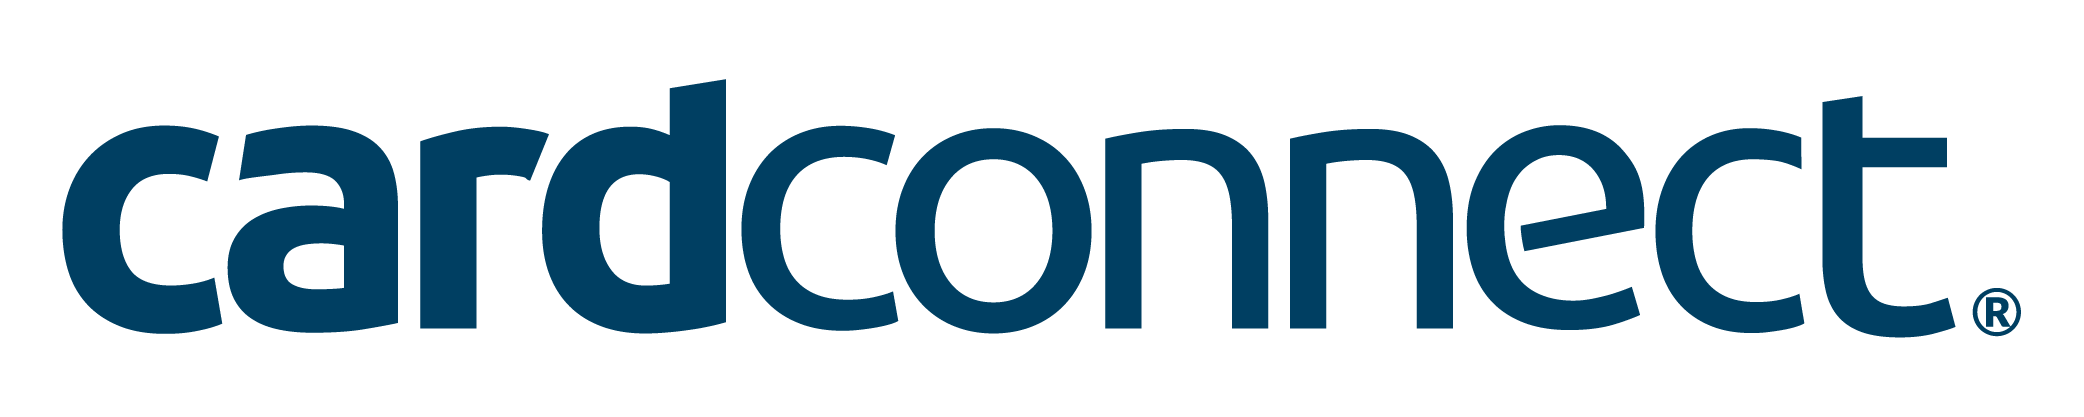 cardconnect logo (1) (1)